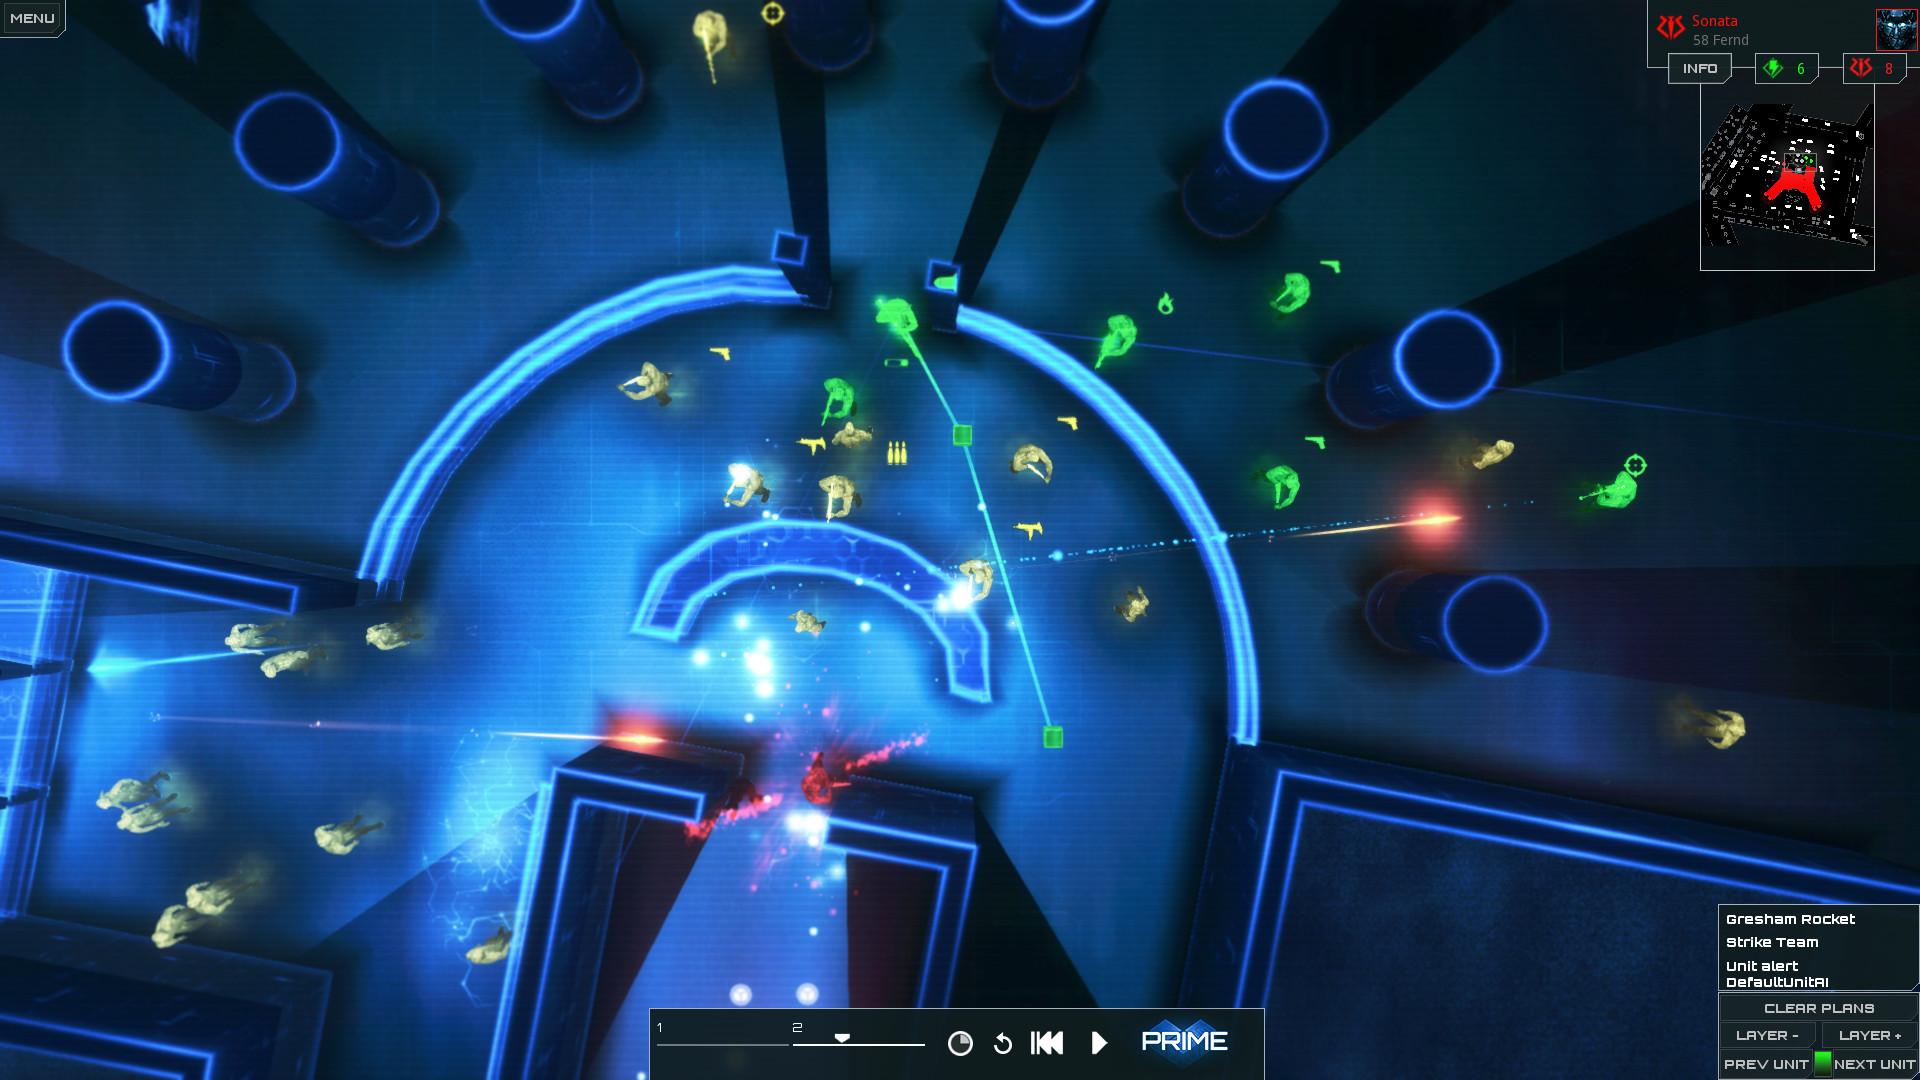 Frozen Synapse Prime on Steam